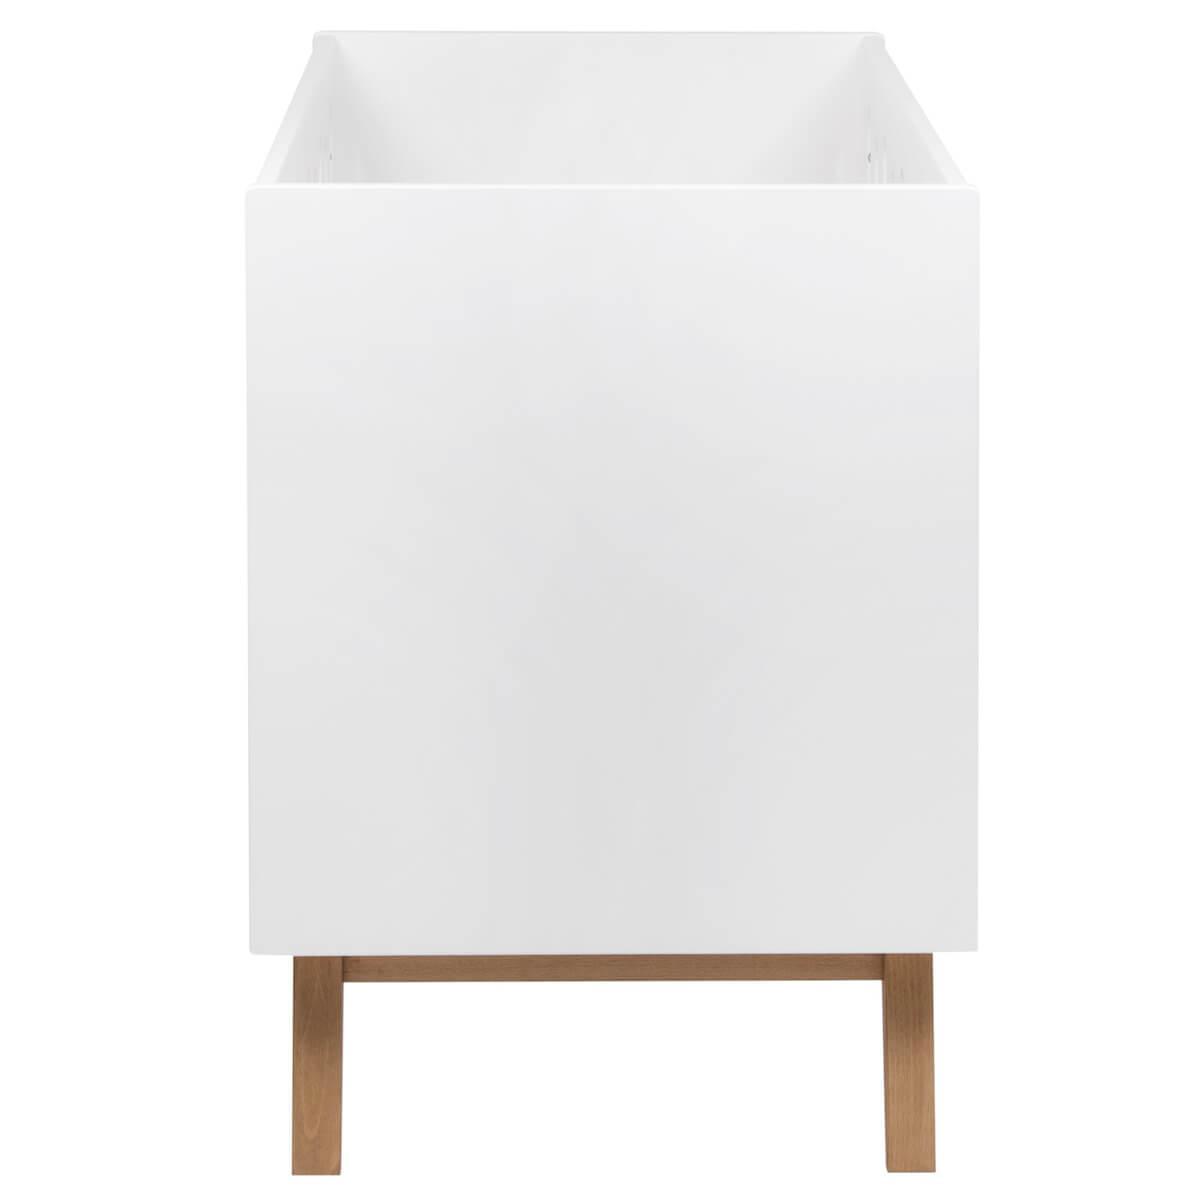 Lit évolutif 60x120cm TRENDY Quax blanc